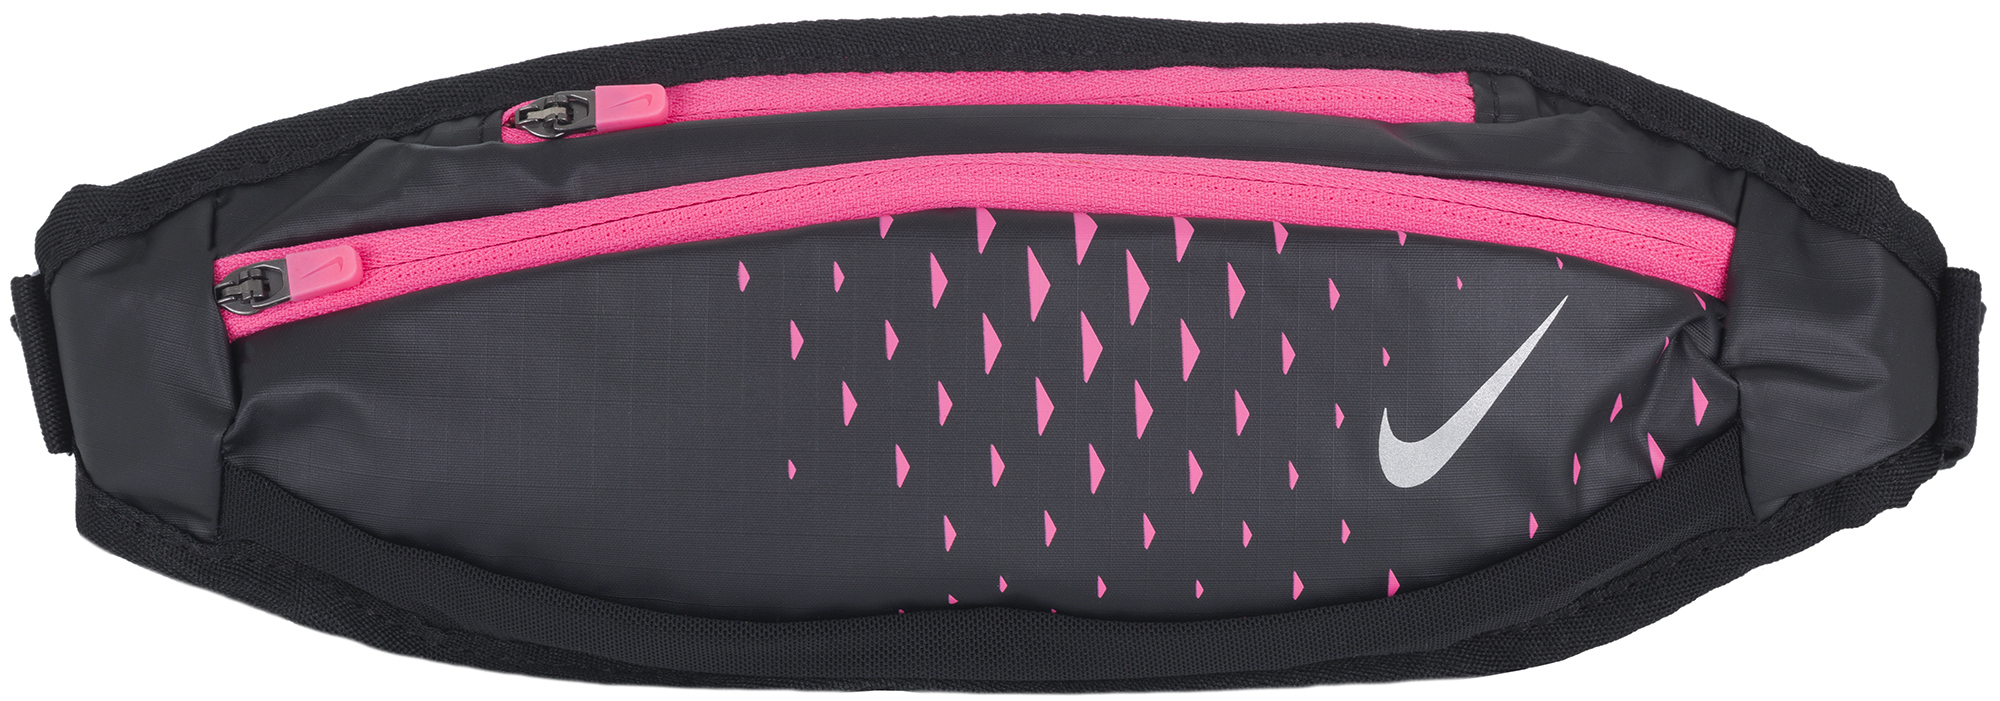 Nike Сумка на пояс женская Nike сумка на пояс женская как называется